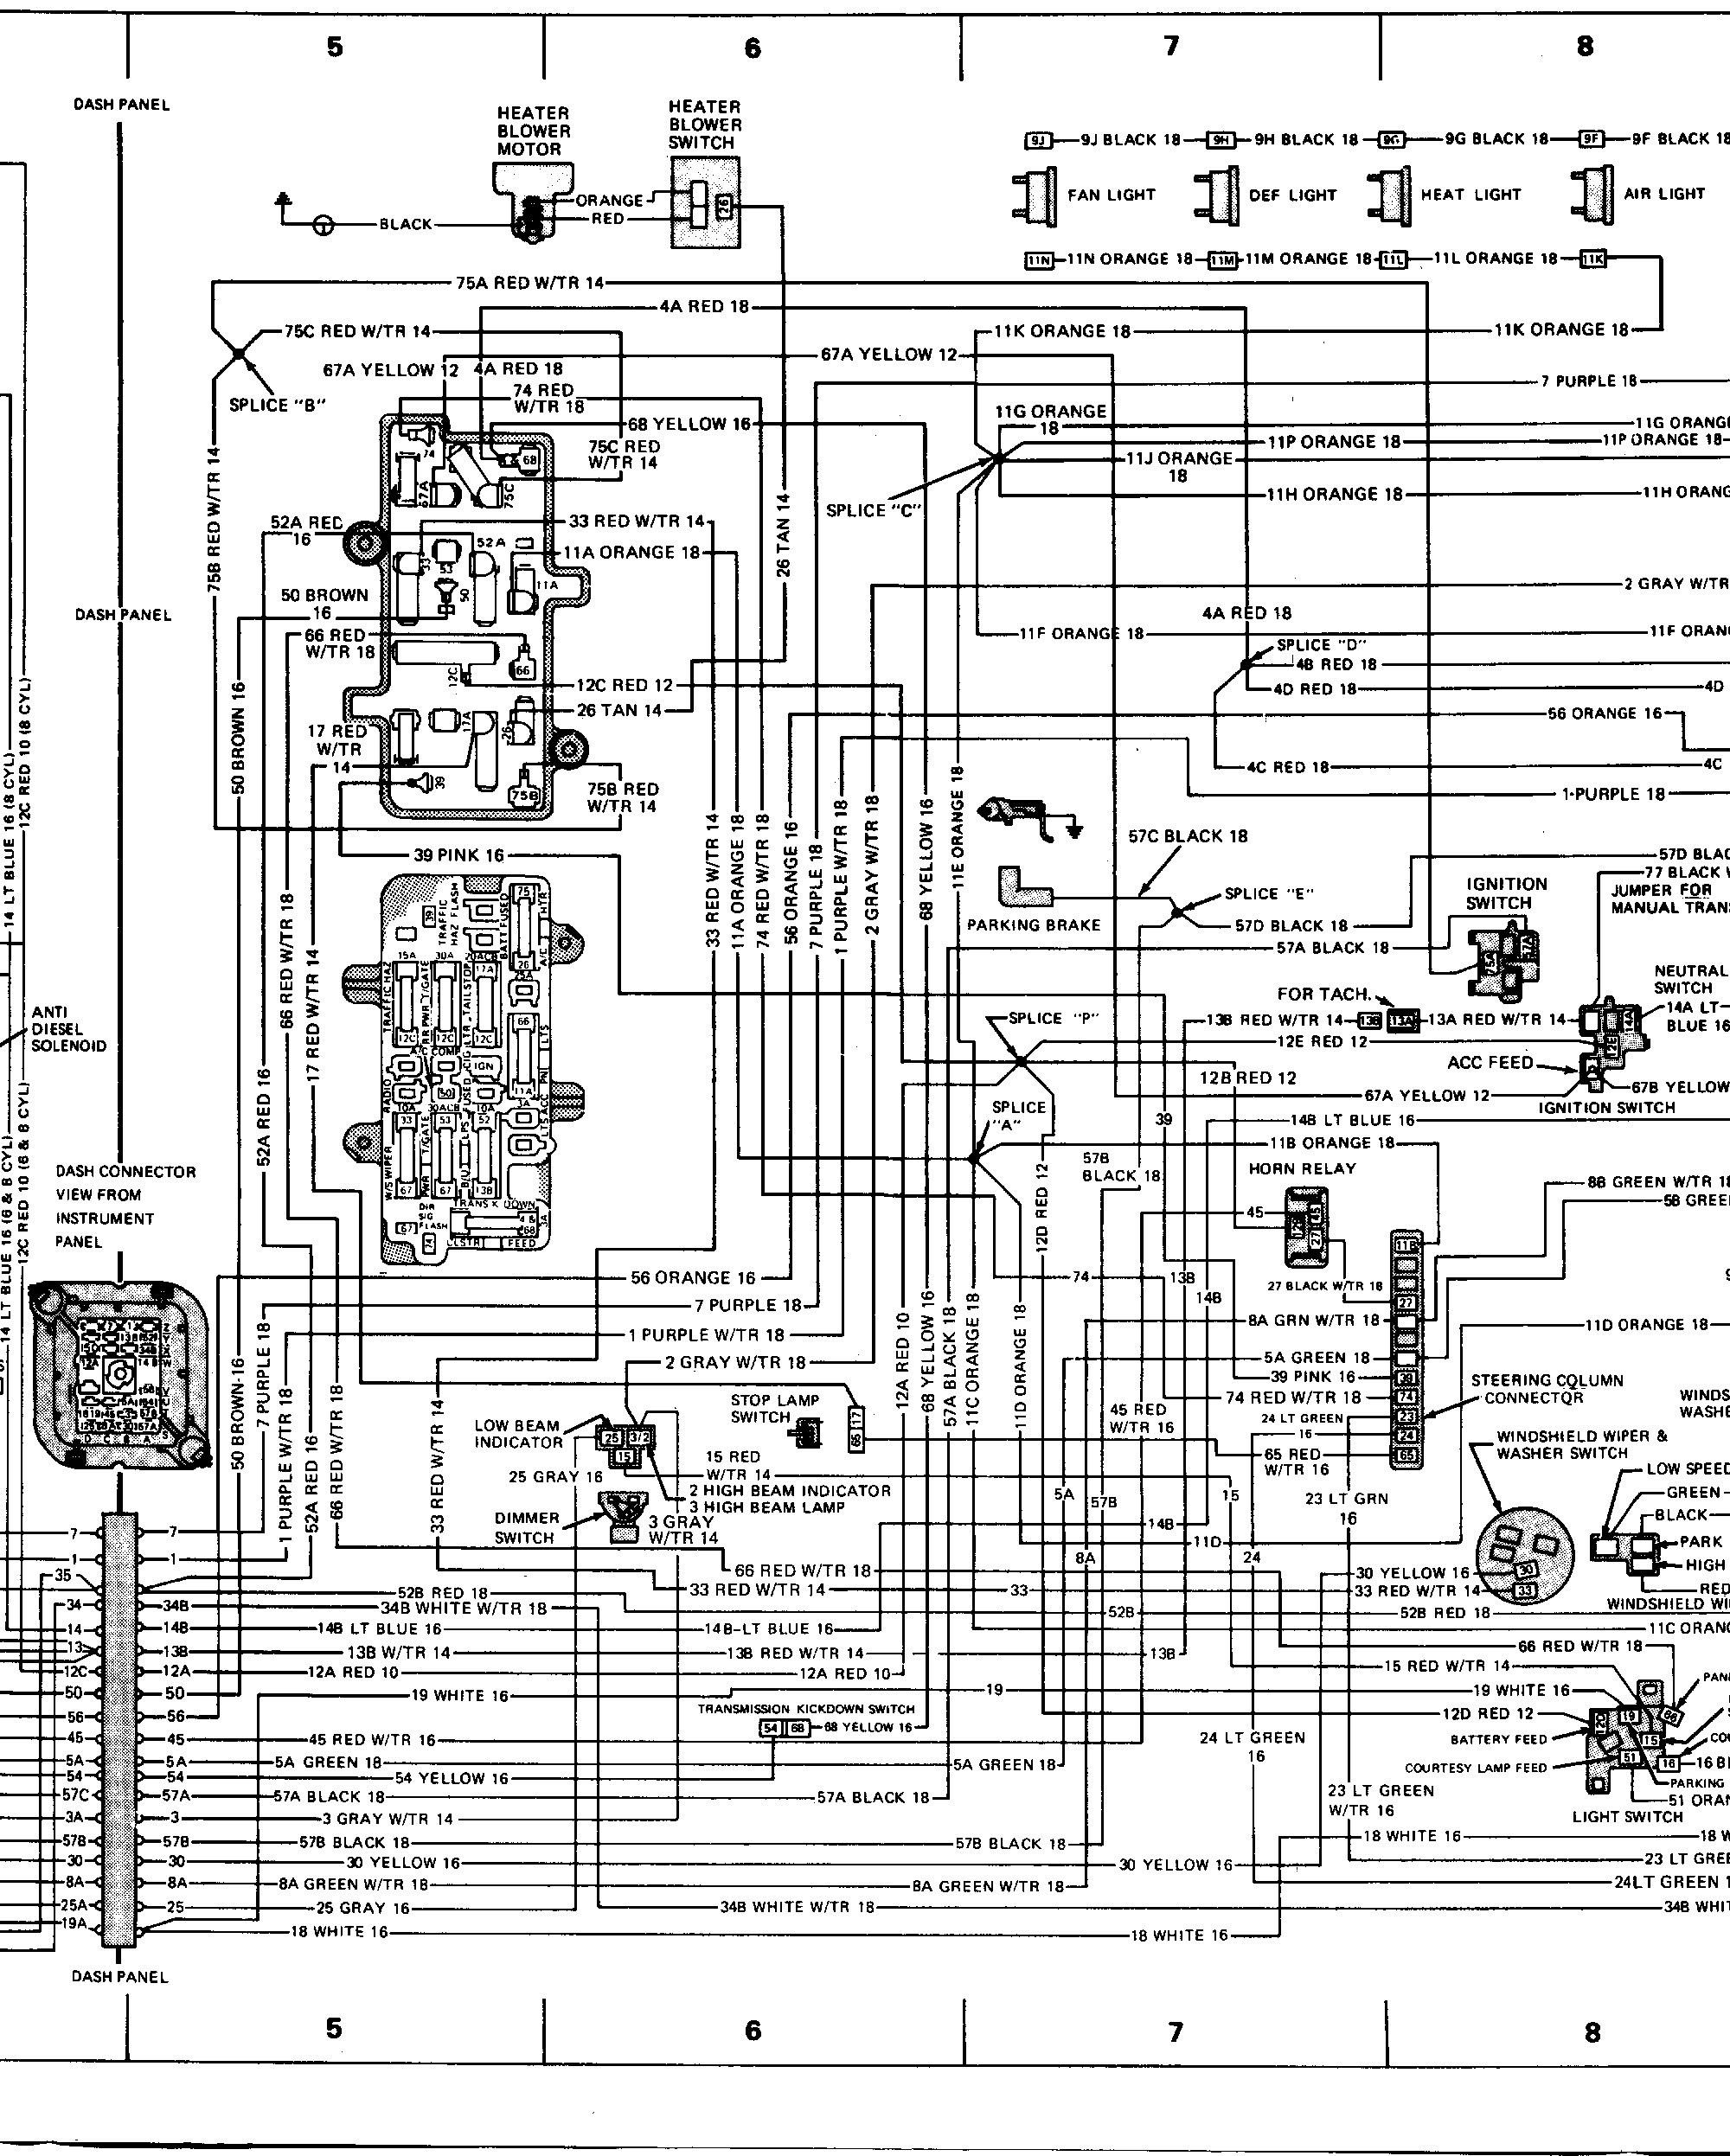 DIAGRAM] Ignition Switch Wiring Diagram 1968 Jeep Gladiator FULL Version HD  Quality Jeep Gladiator - FREEBOOKS26.AMANDINE-BREVELAY.FRfreebooks26.amandine-brevelay.fr